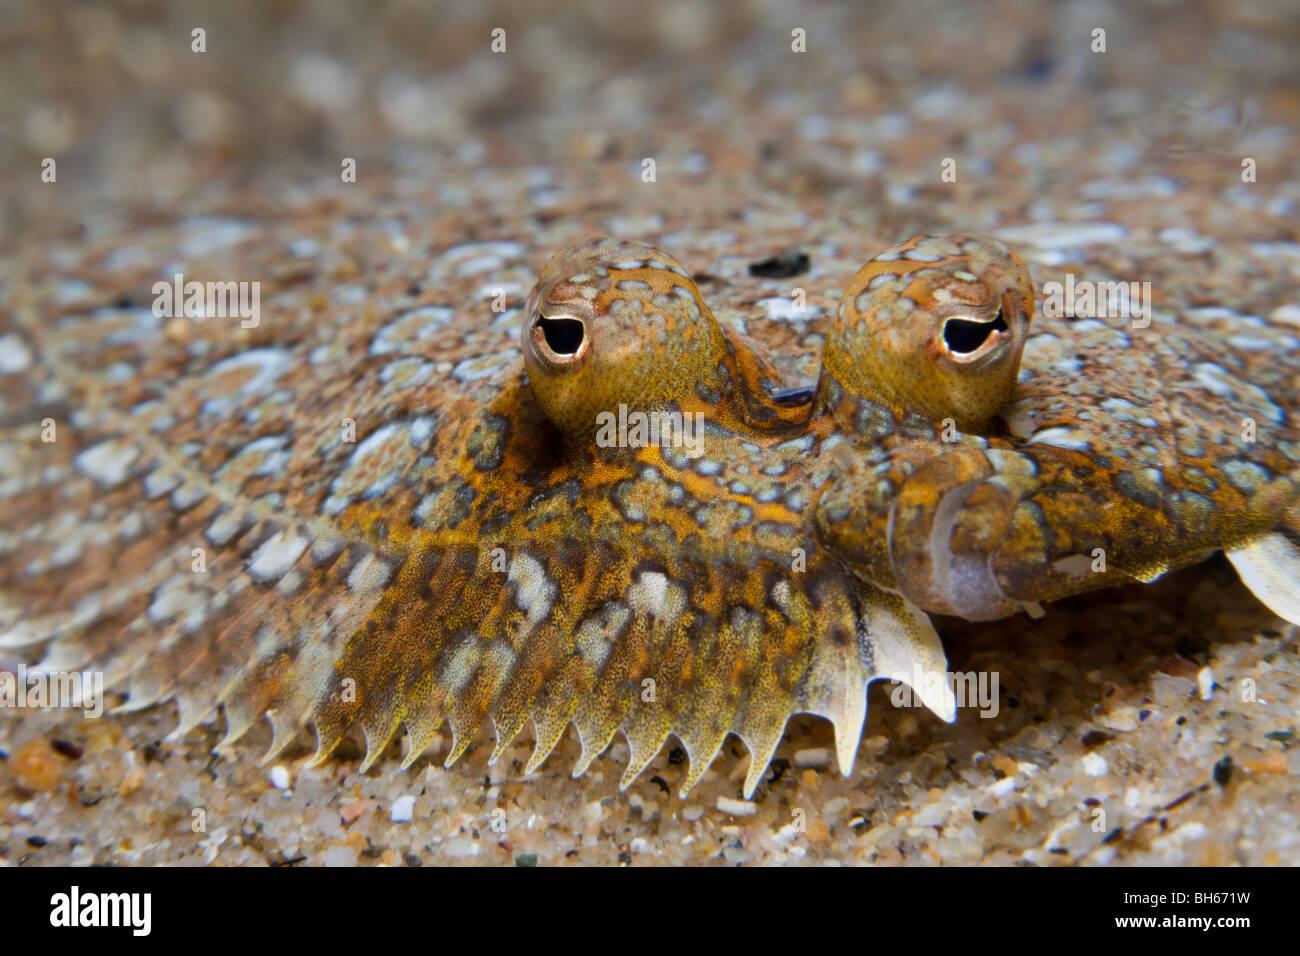 Mediterranean Sole, Monchirus hispidus, Tamariu, Costa Brava, Mediterranean Sea, Spain - Stock Image